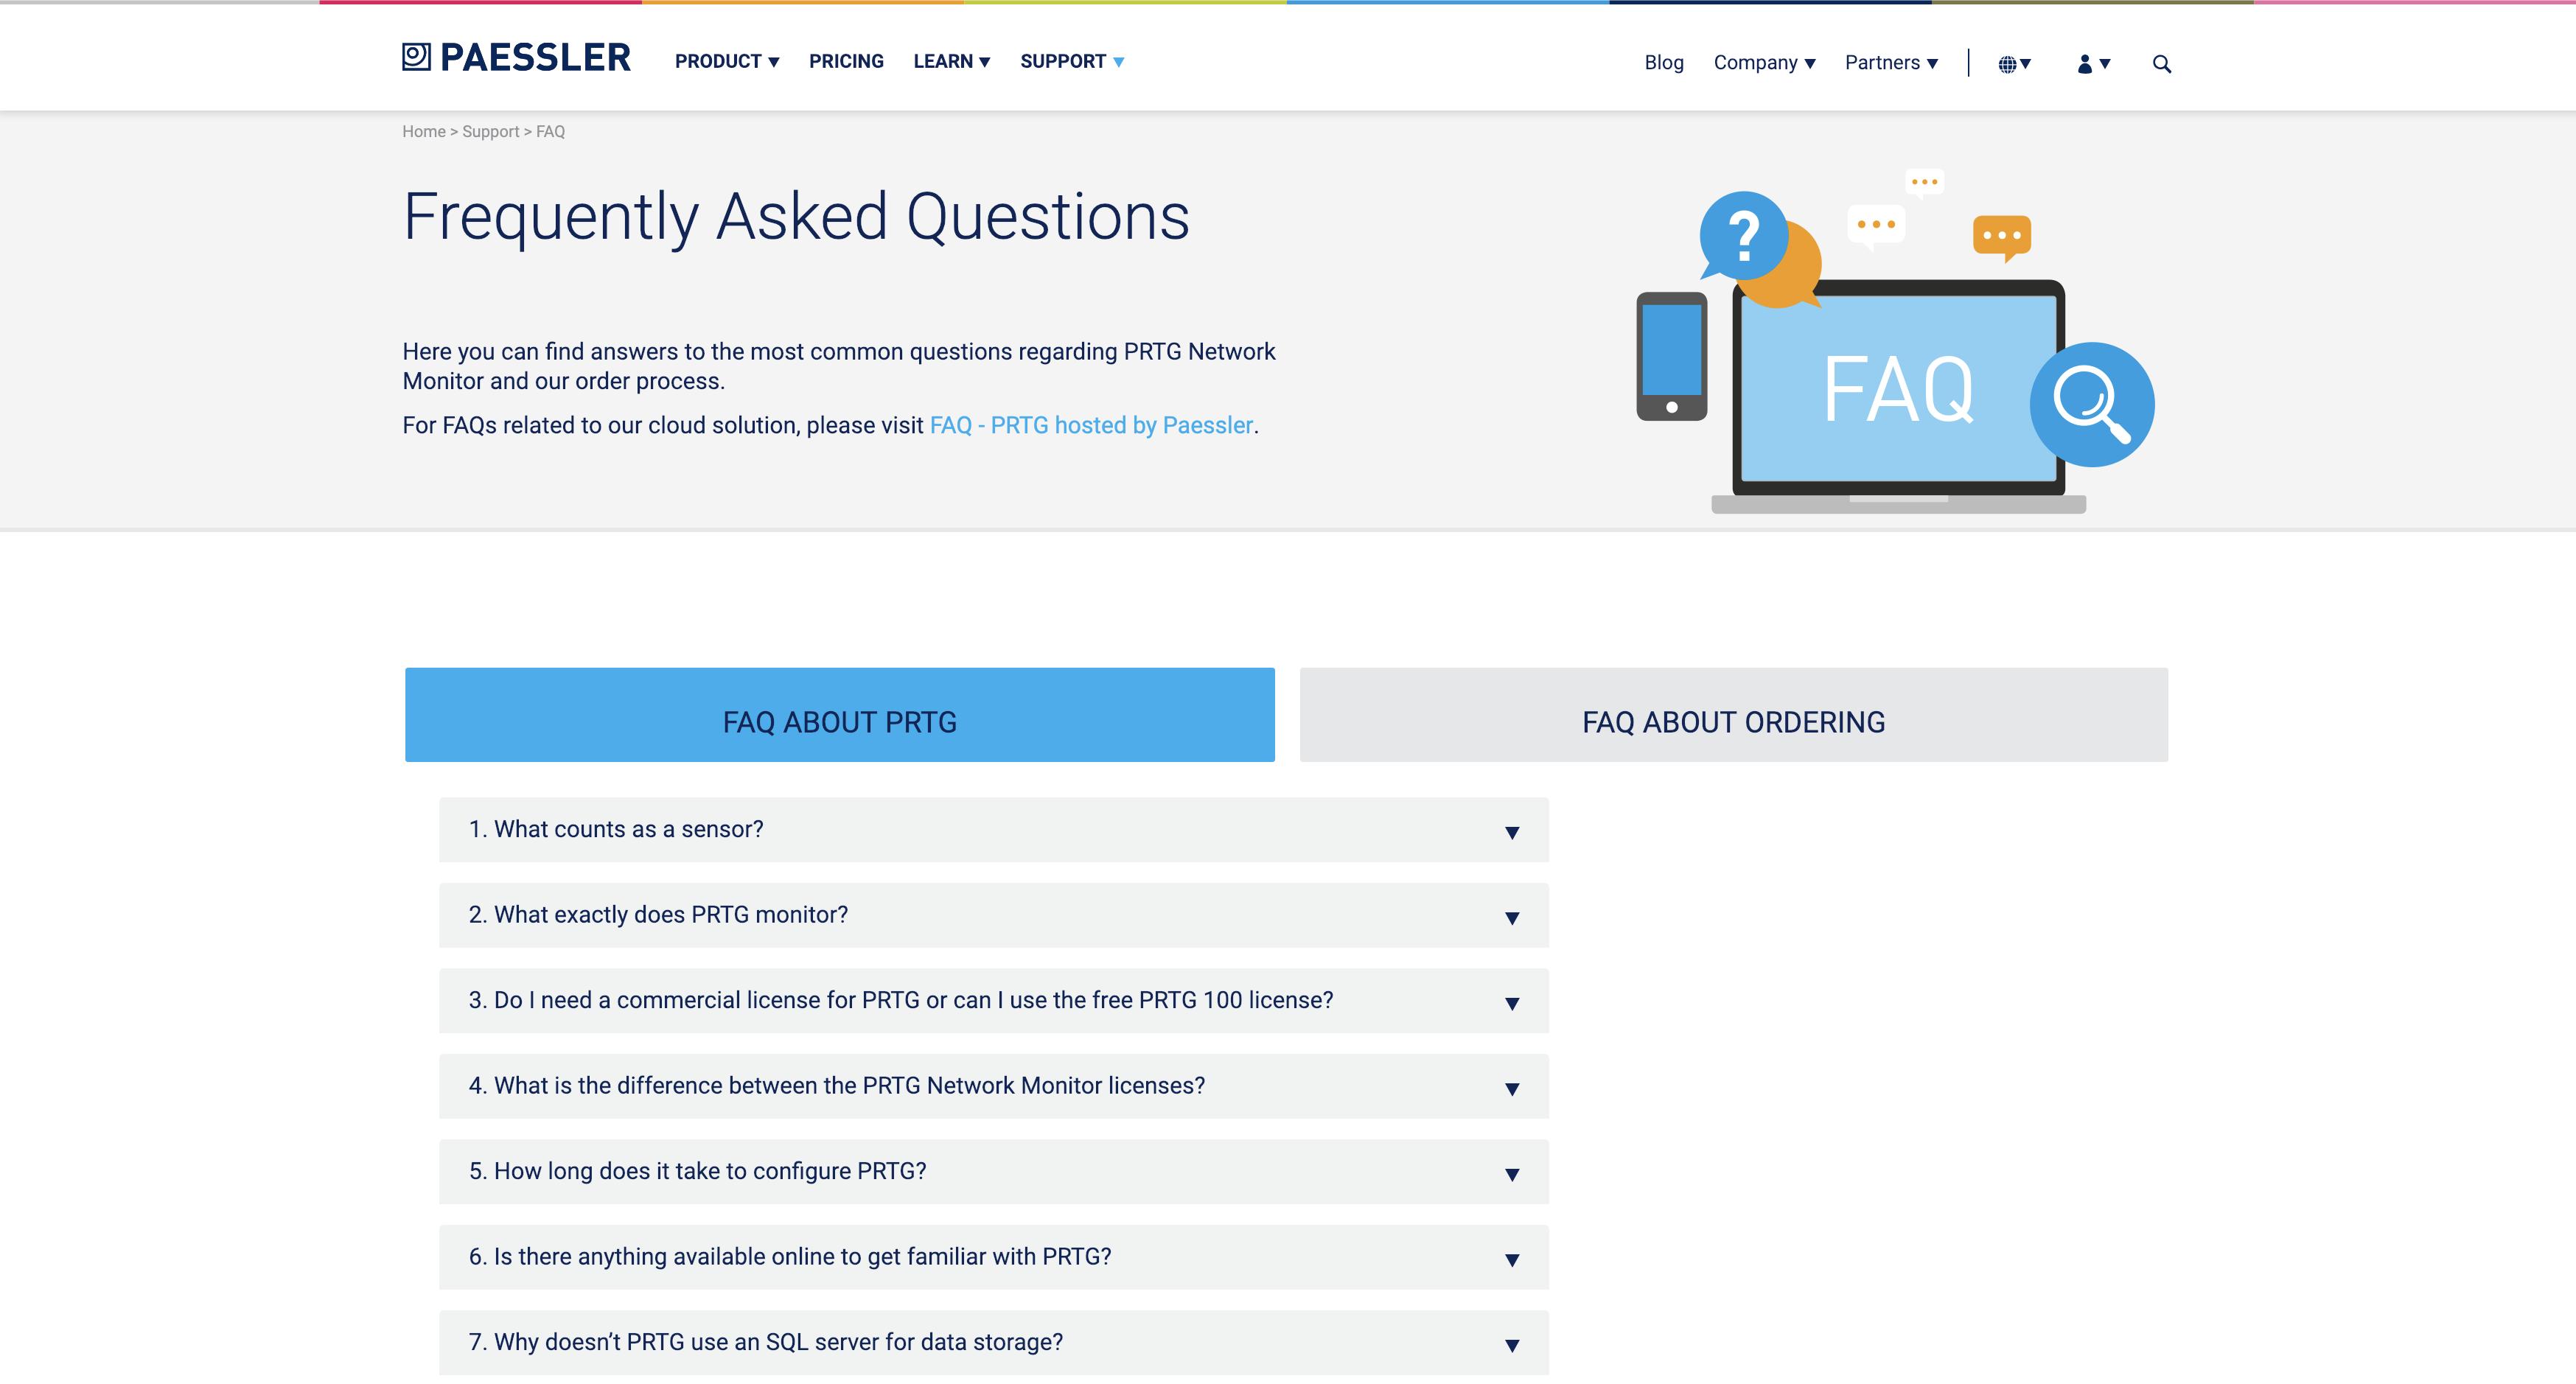 The PRTG FAQ